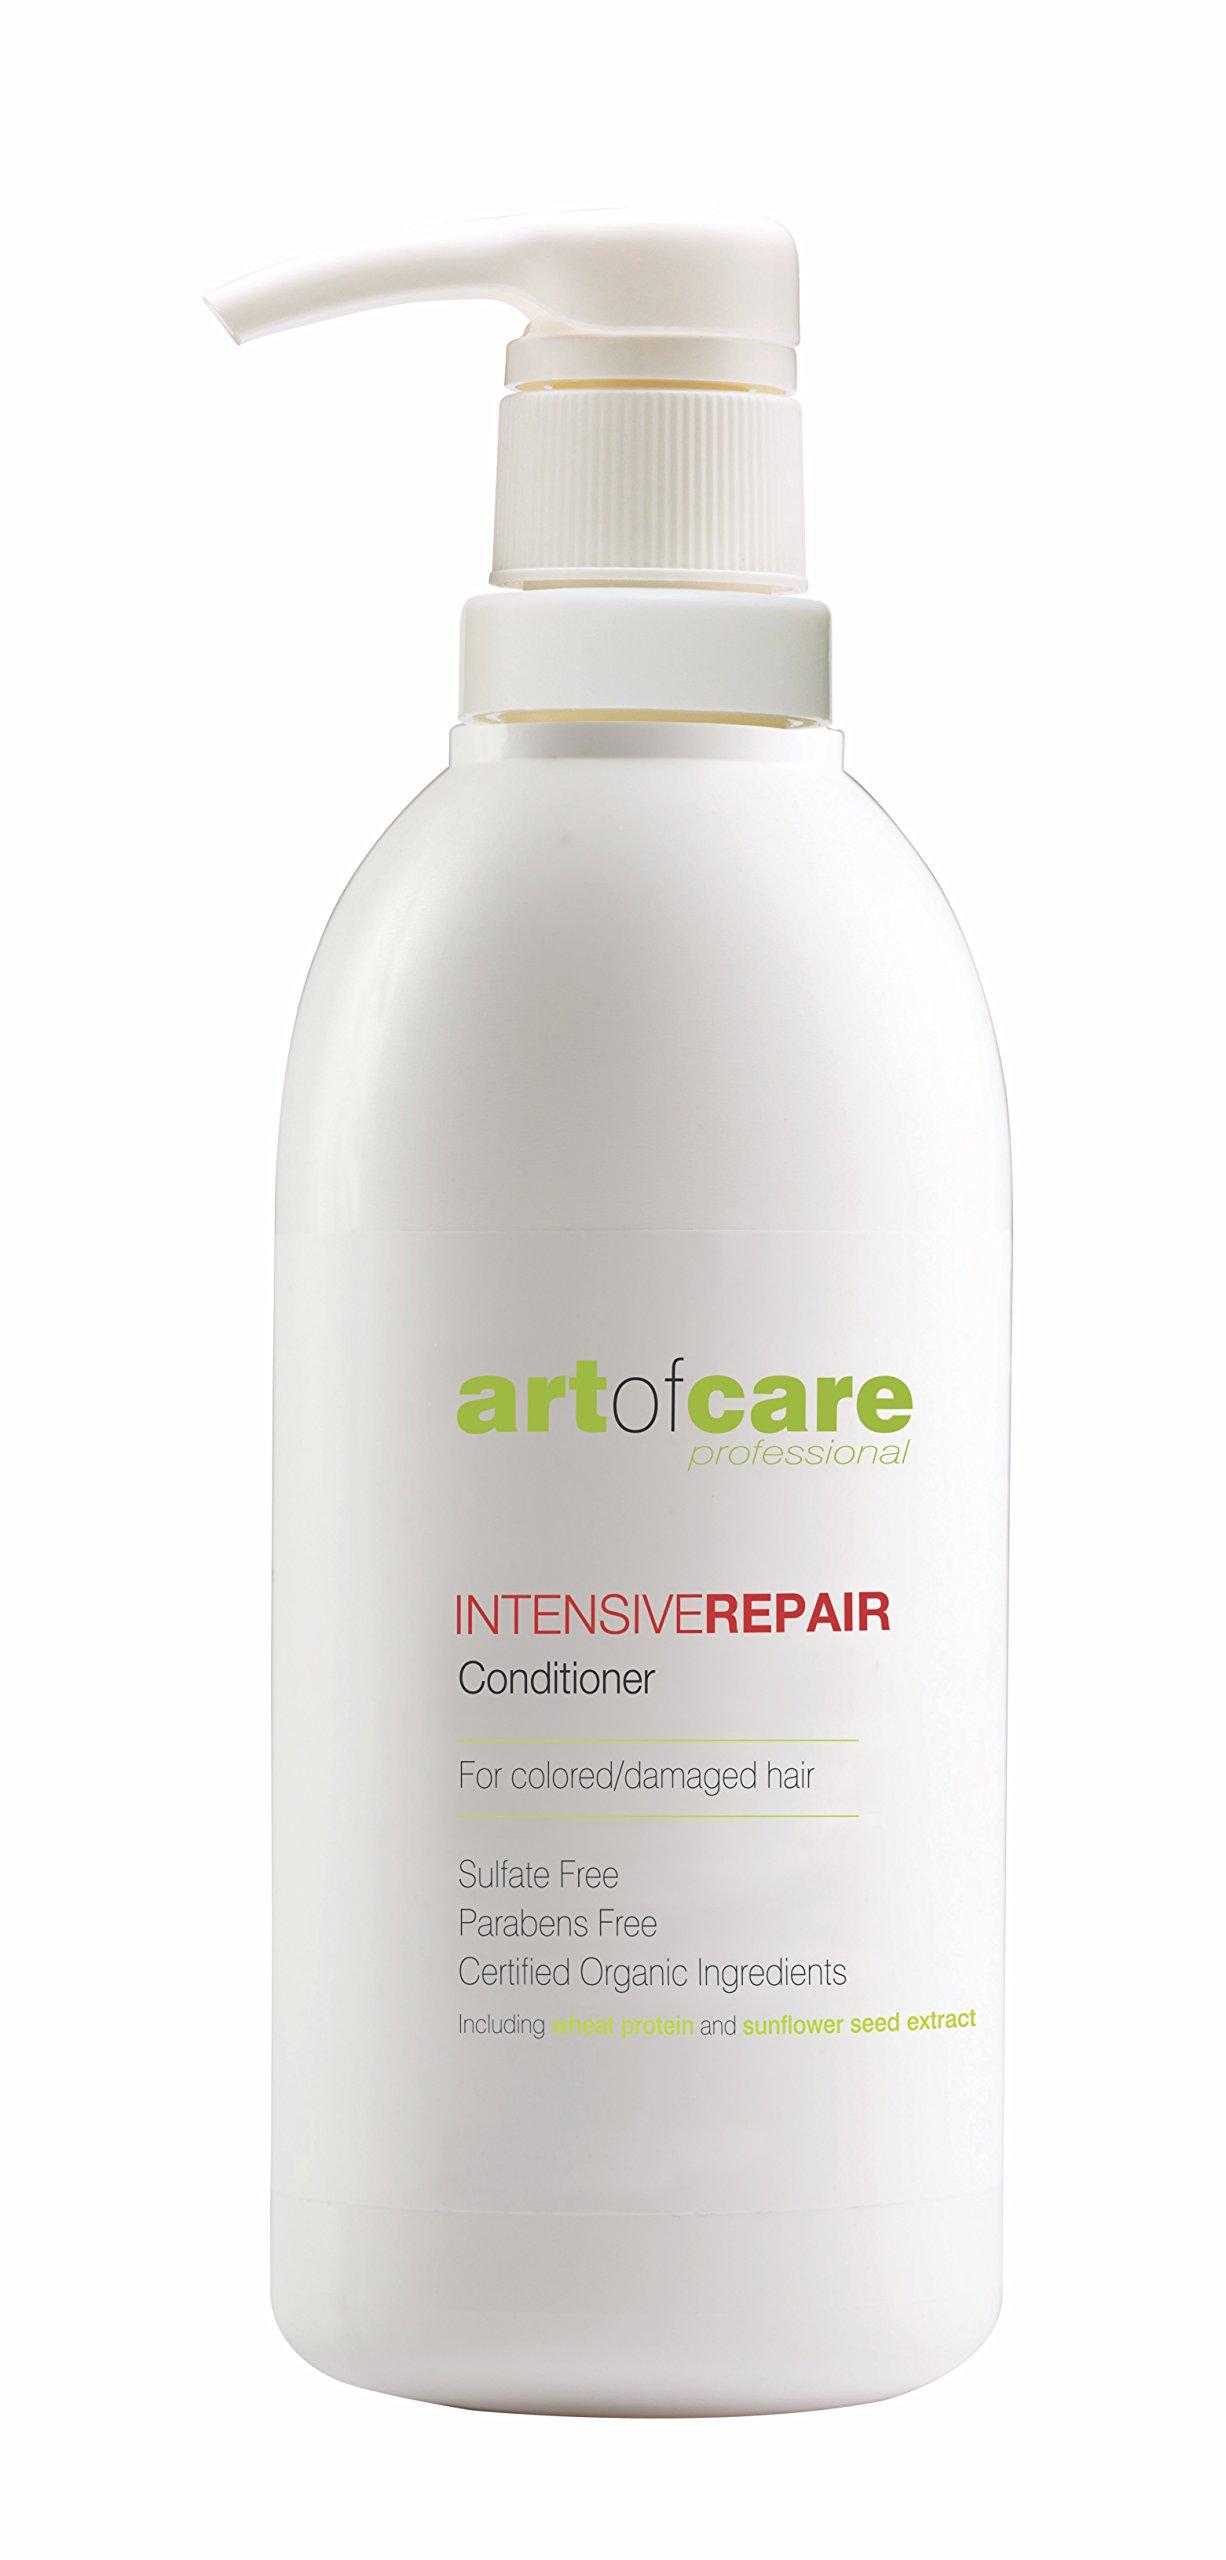 Amazon Onc Artofcare Intensiverepair Sulfate Free Shampoo 338